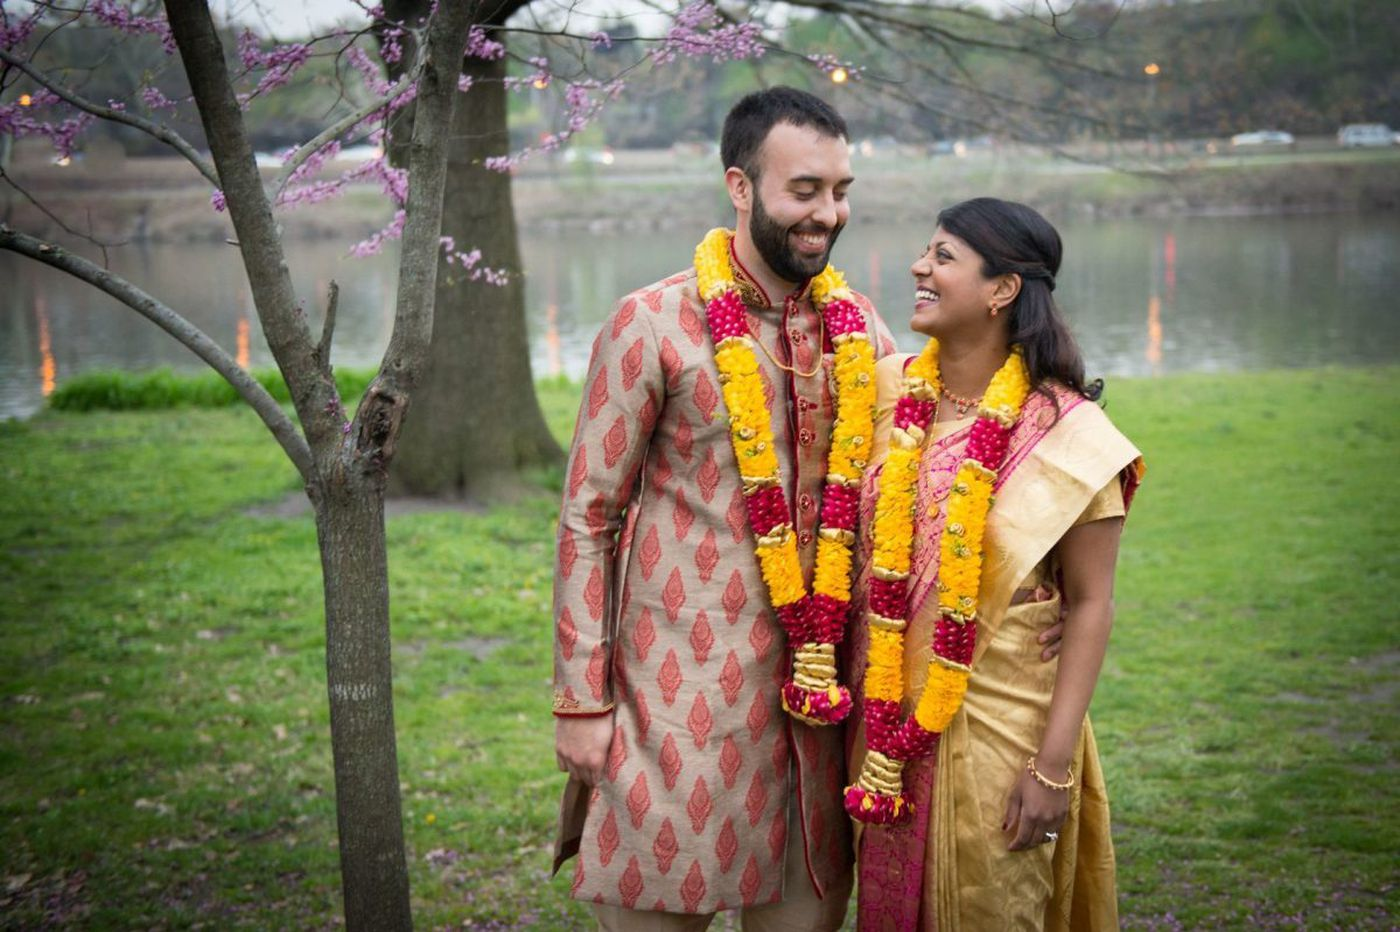 Philadelphia weddings: Samy Jana and Chris Nieves